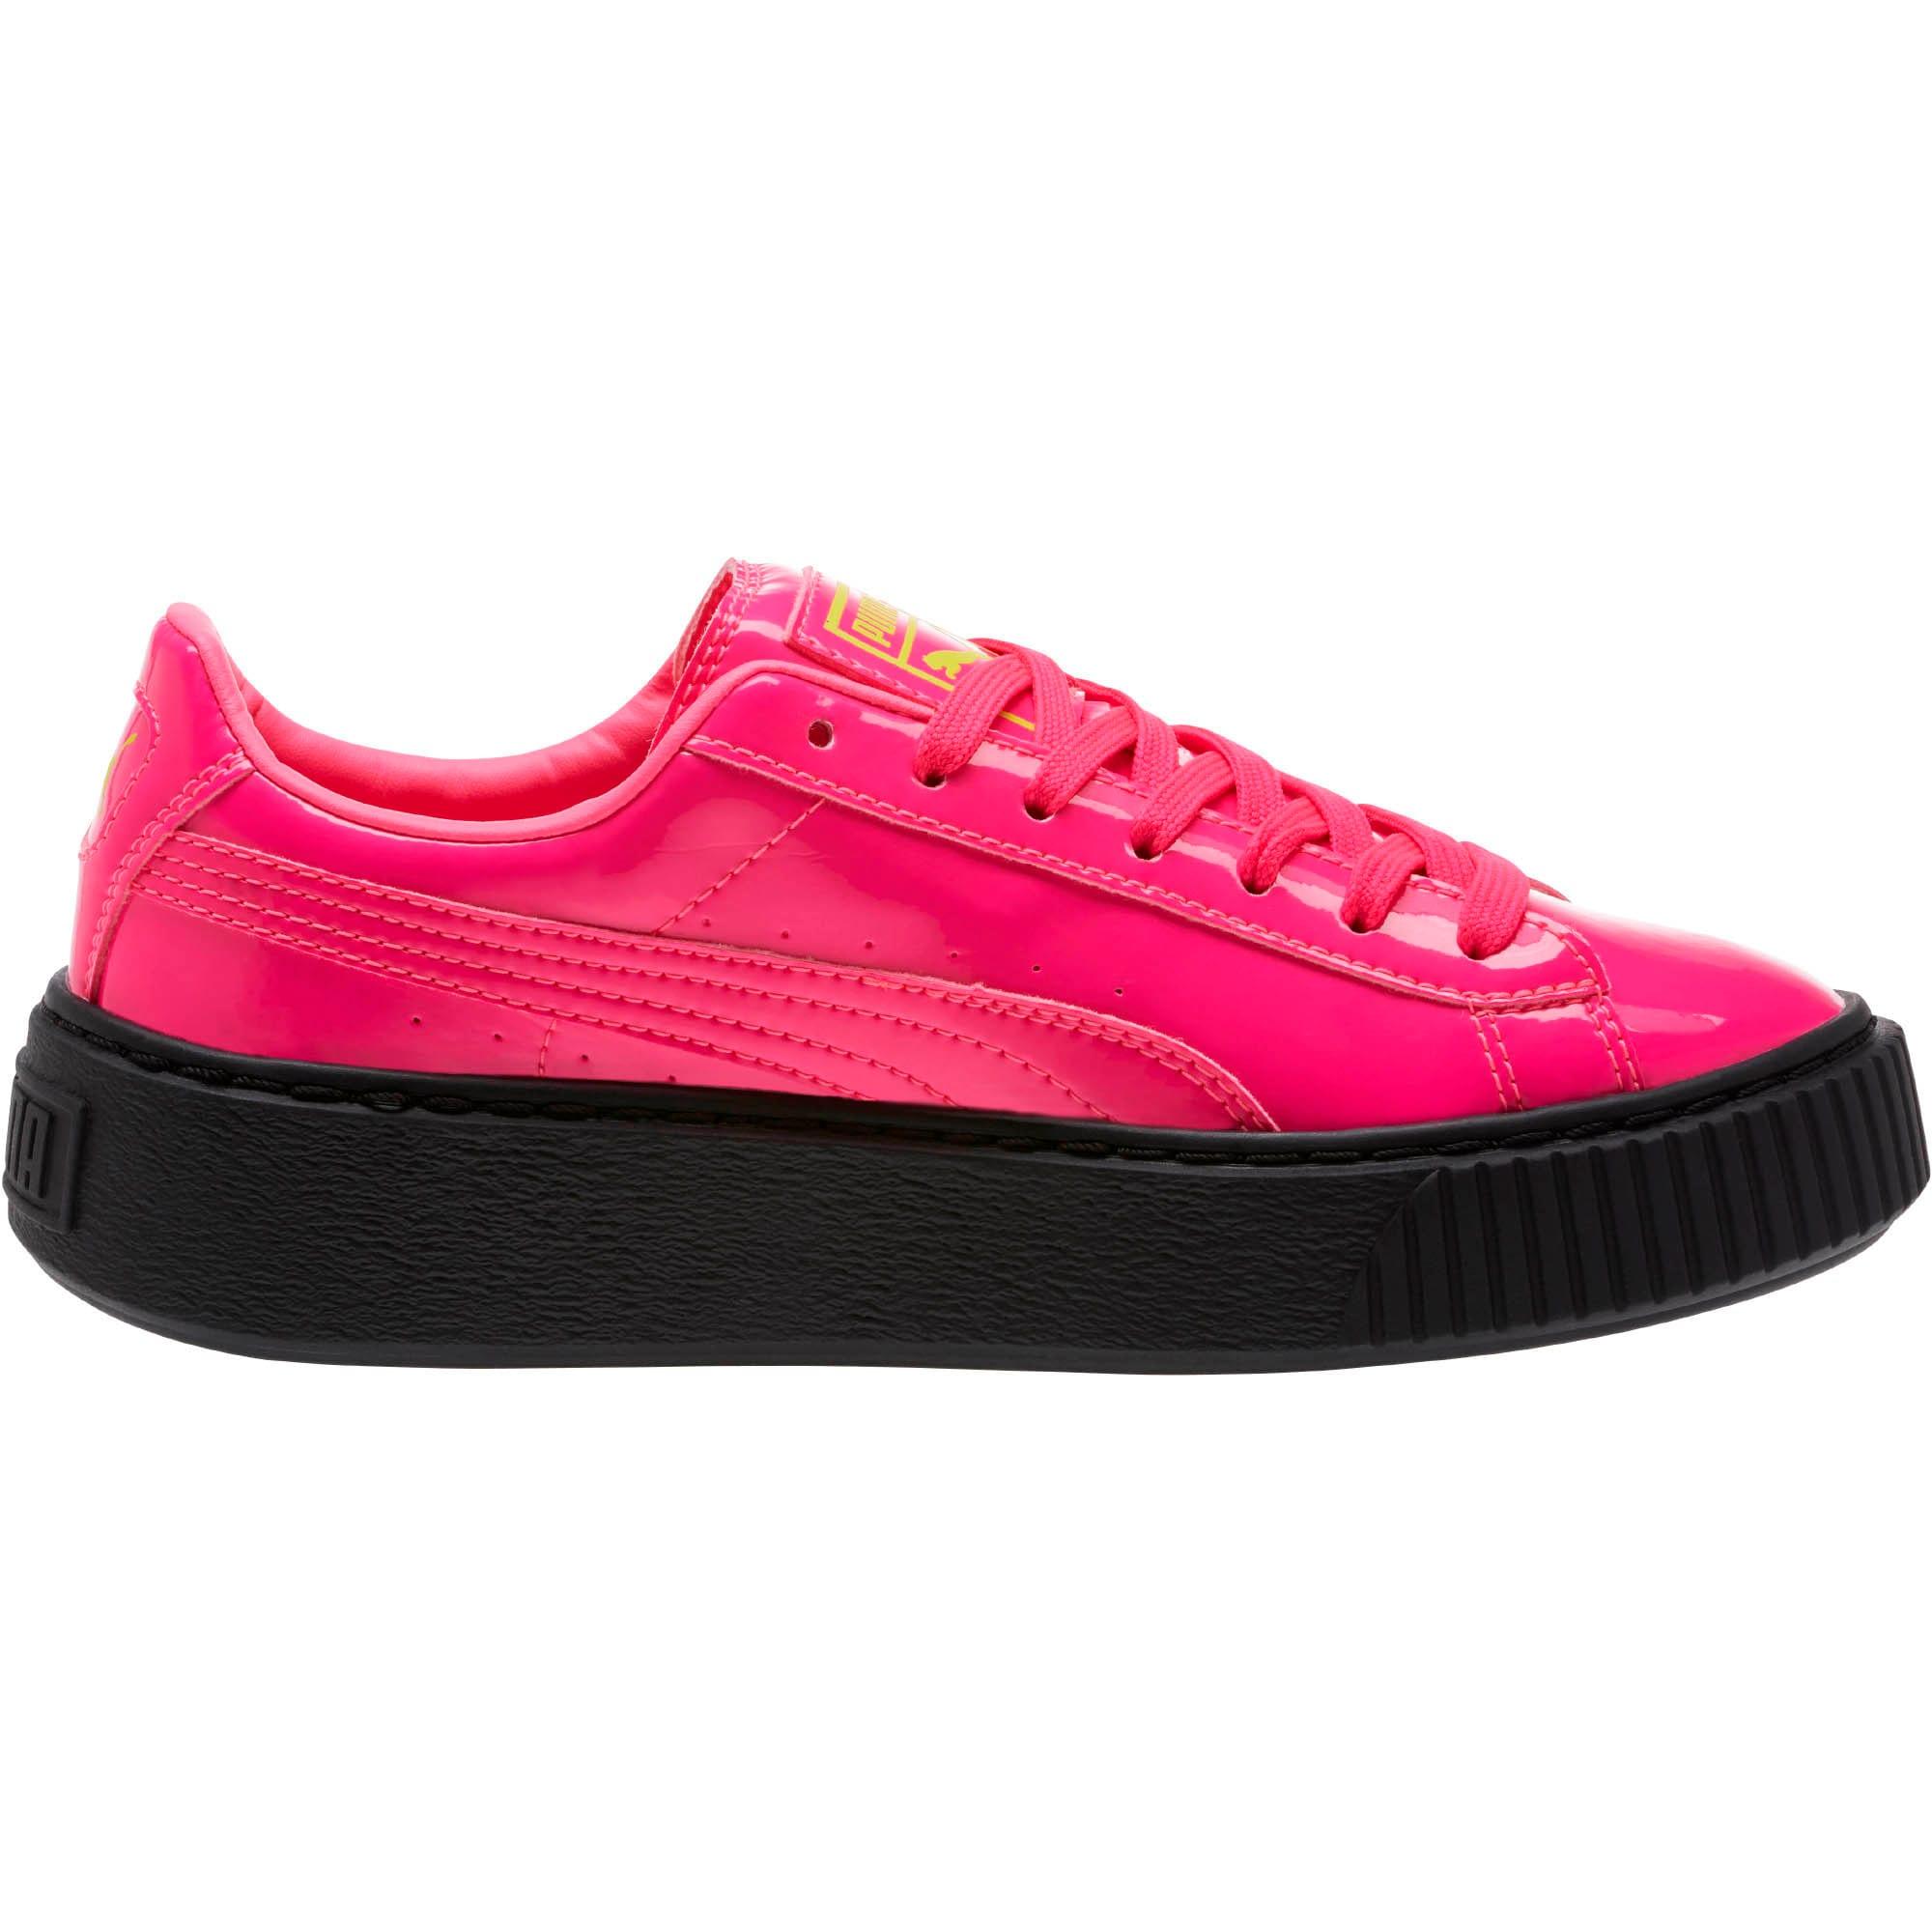 Thumbnail 3 of Basket Platform Block JR  Sneakers, PINK-Sulphur Spr-Black, medium